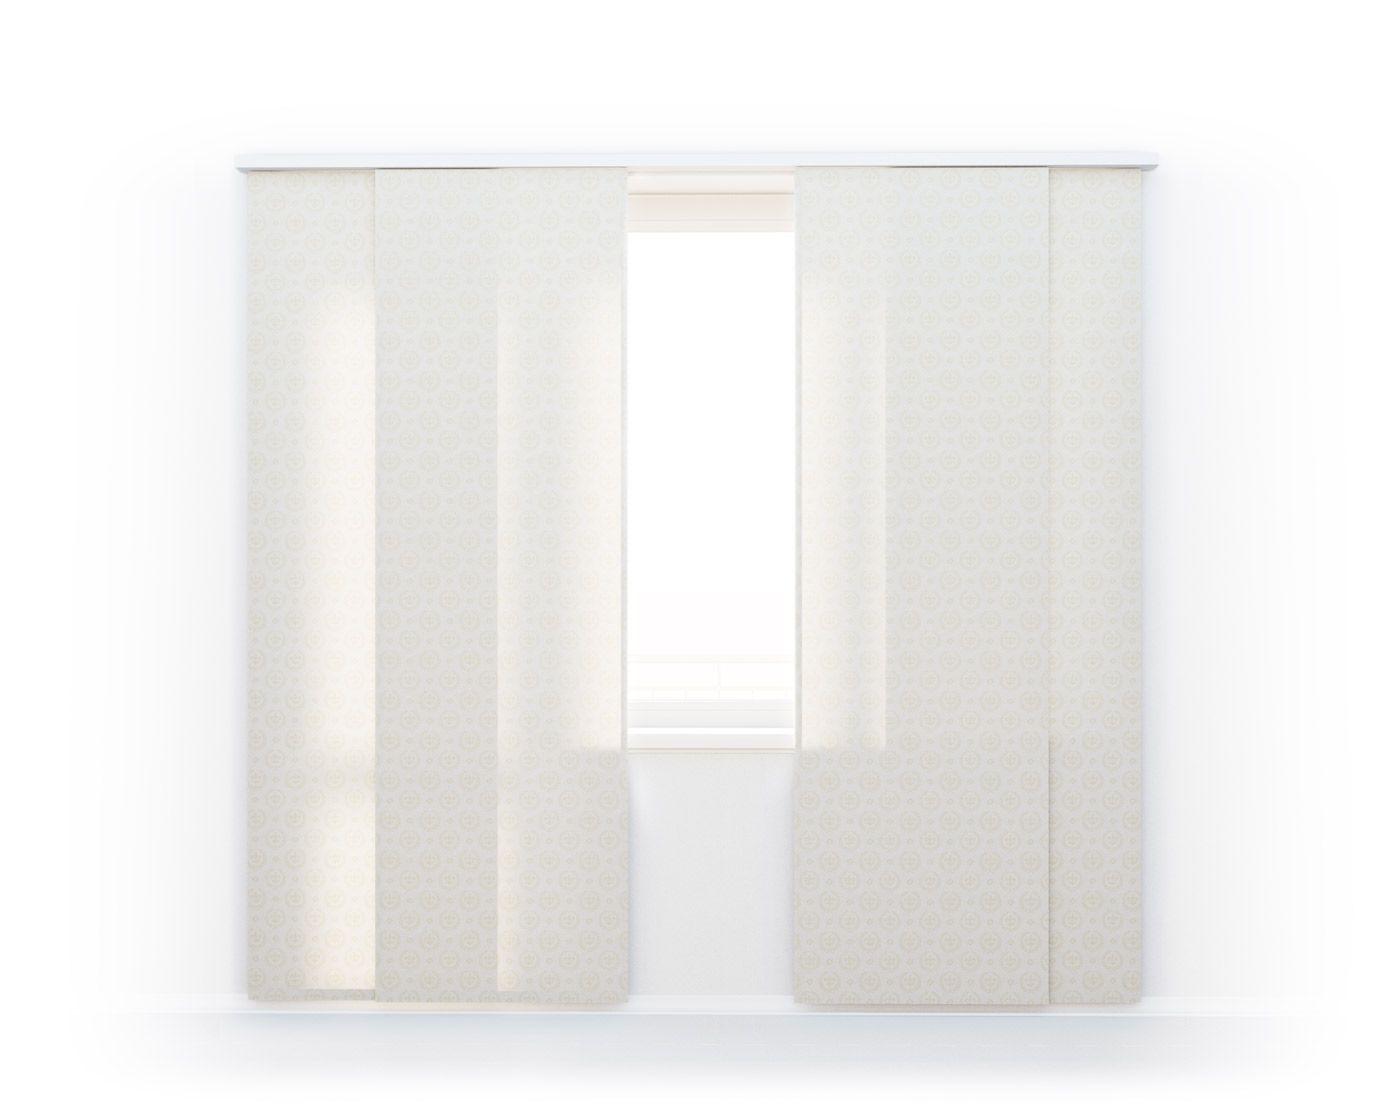 Японские шторы Louis D'or, 2382/12